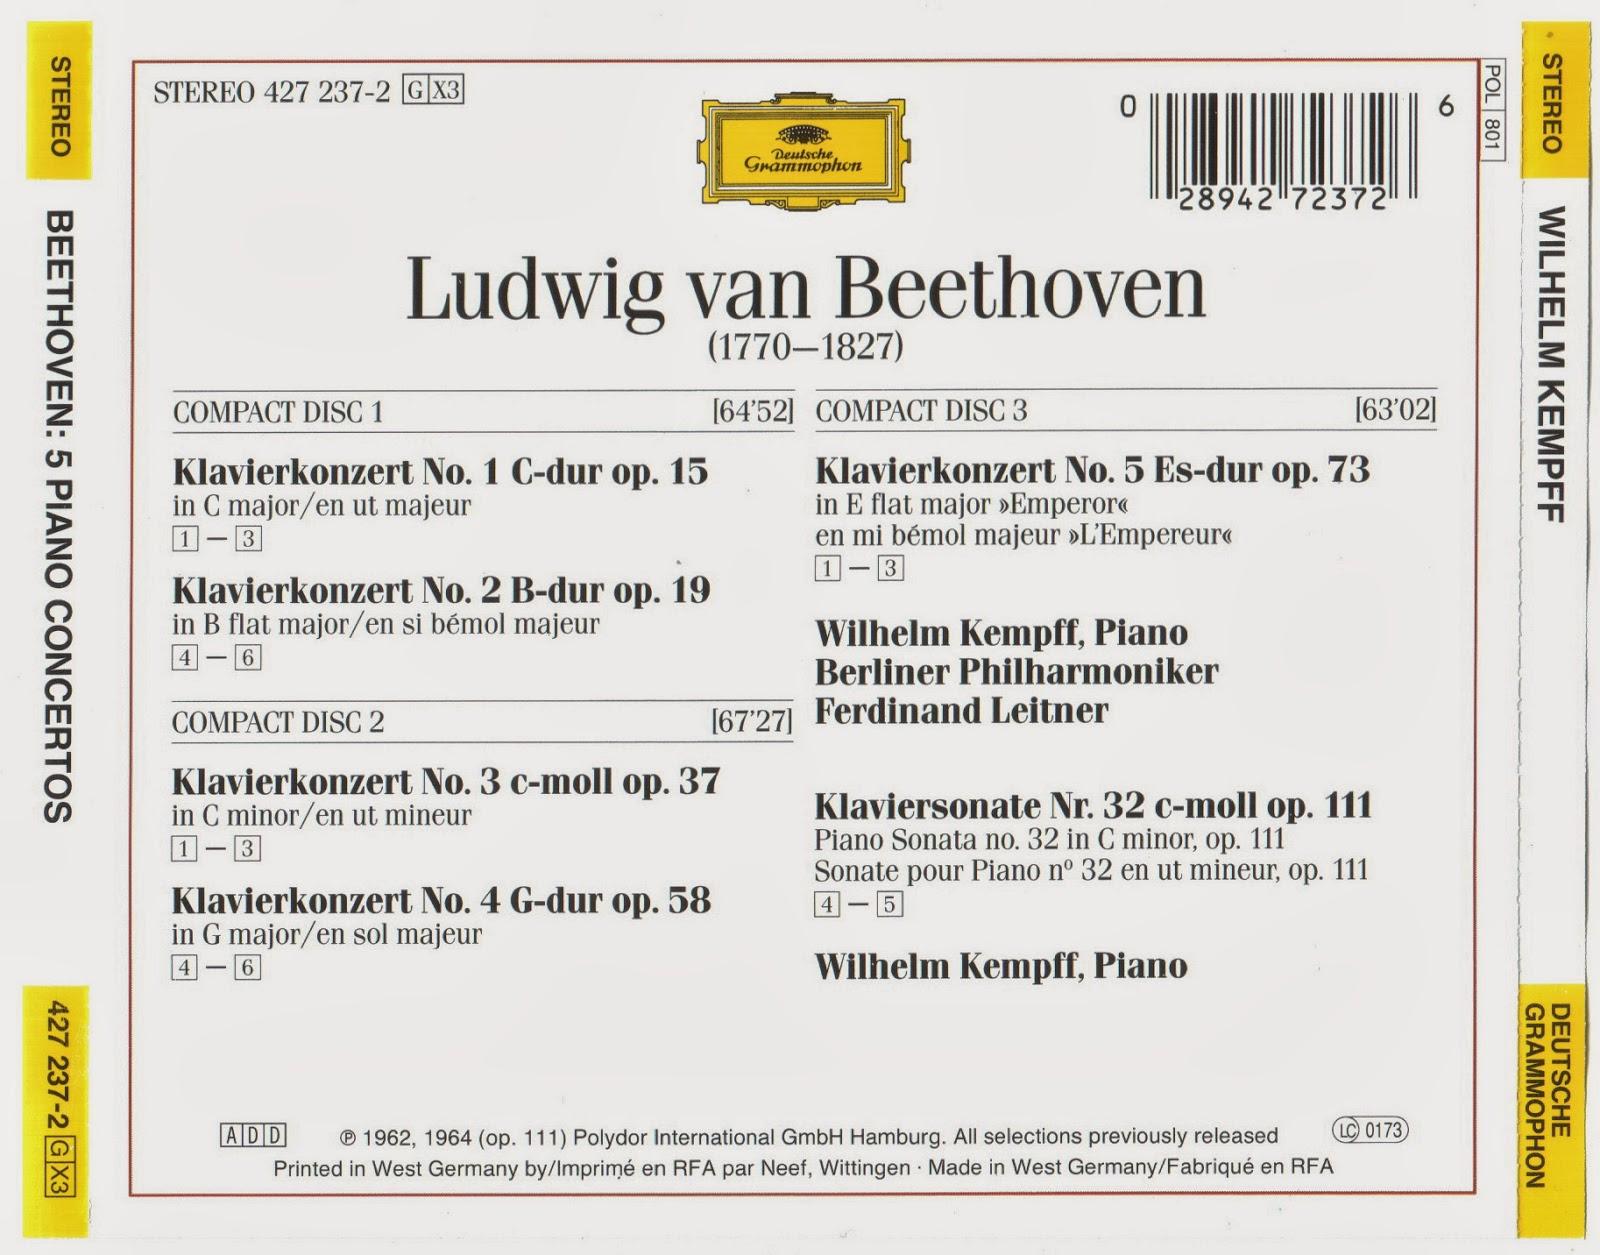 Opus 58. G Major pauer . Sol Majeur Beethoven : Klavier-konzert G Dur